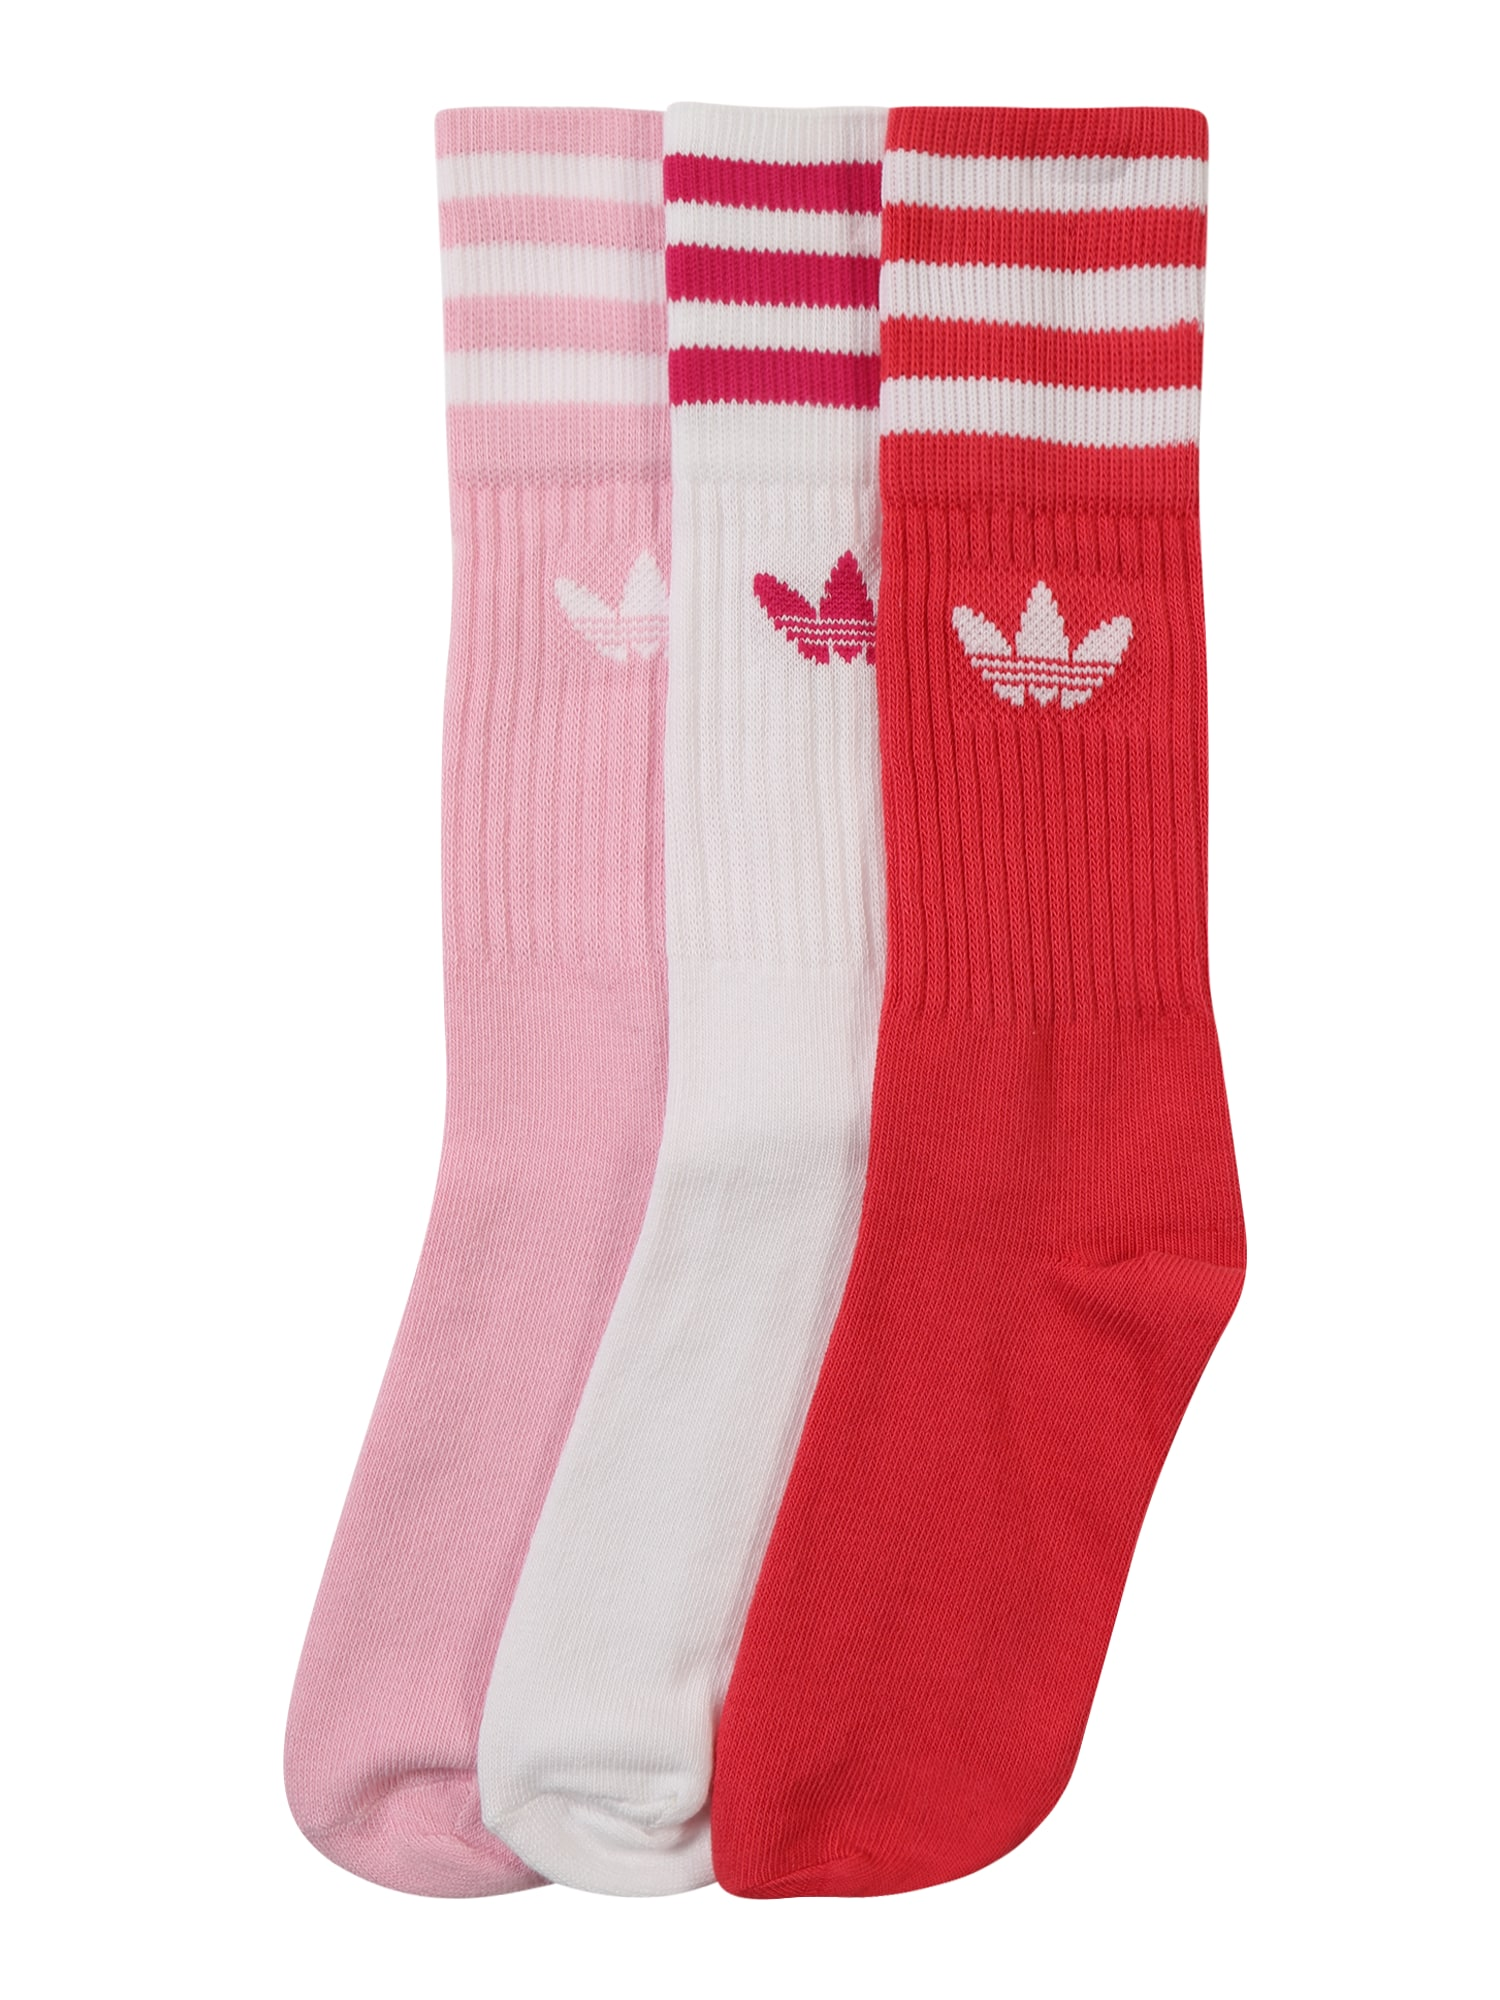 Ponožky SOLID CREW pink světle červená bílá ADIDAS ORIGINALS